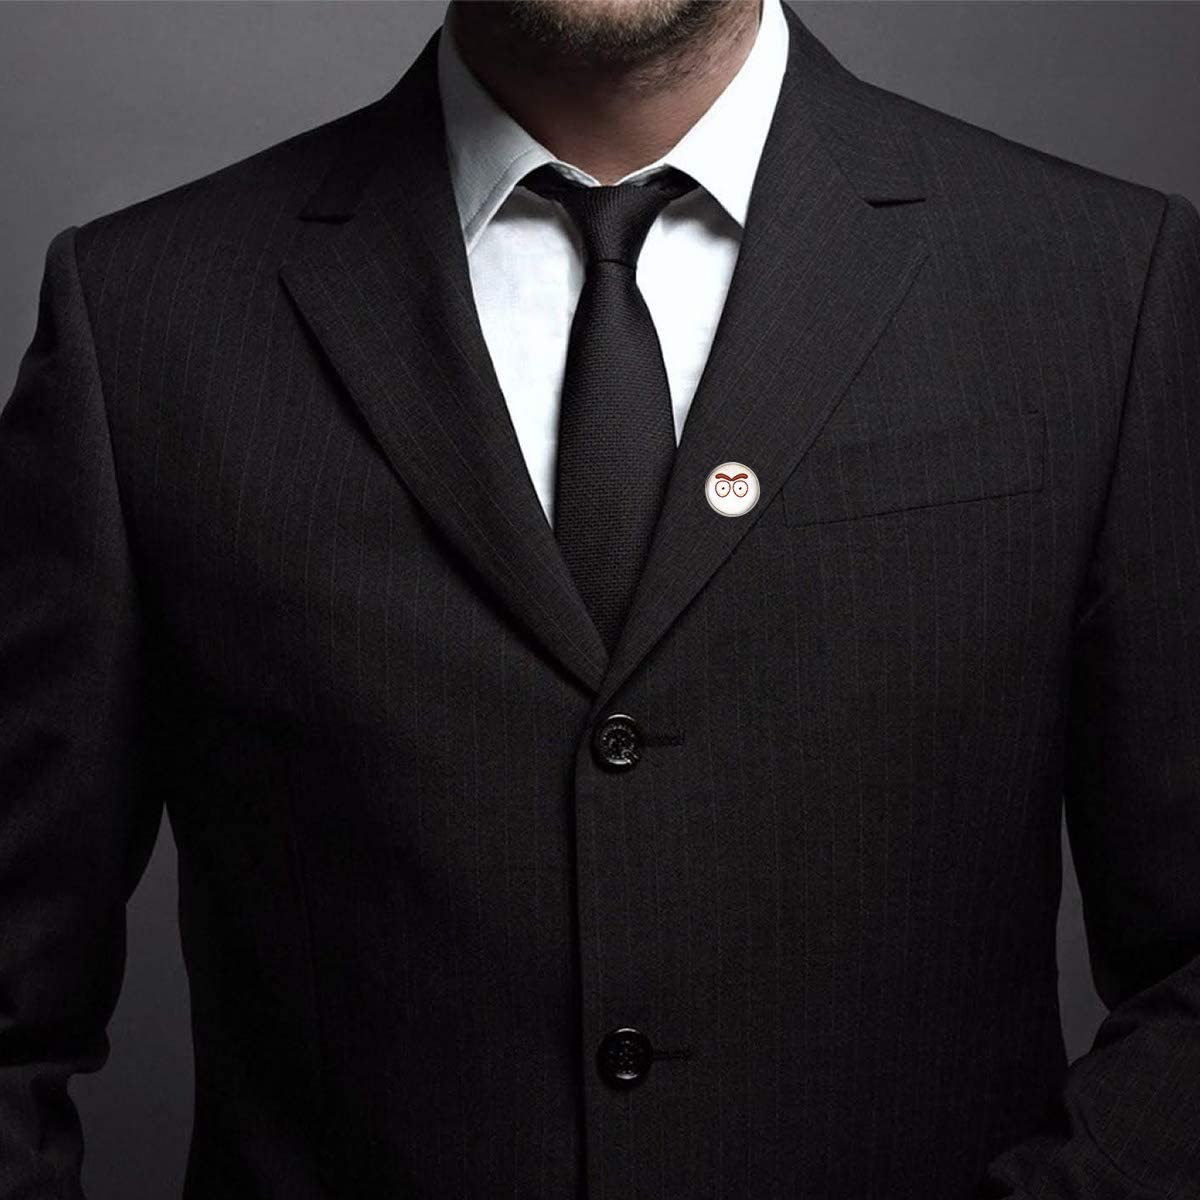 WAZZIT Round Metal Tie Tack Hat Lapel Pin Brooches Burst Tendons Eyes Banquet Badge Enamel Pins Trendy Accessory Jacket T-Shirt